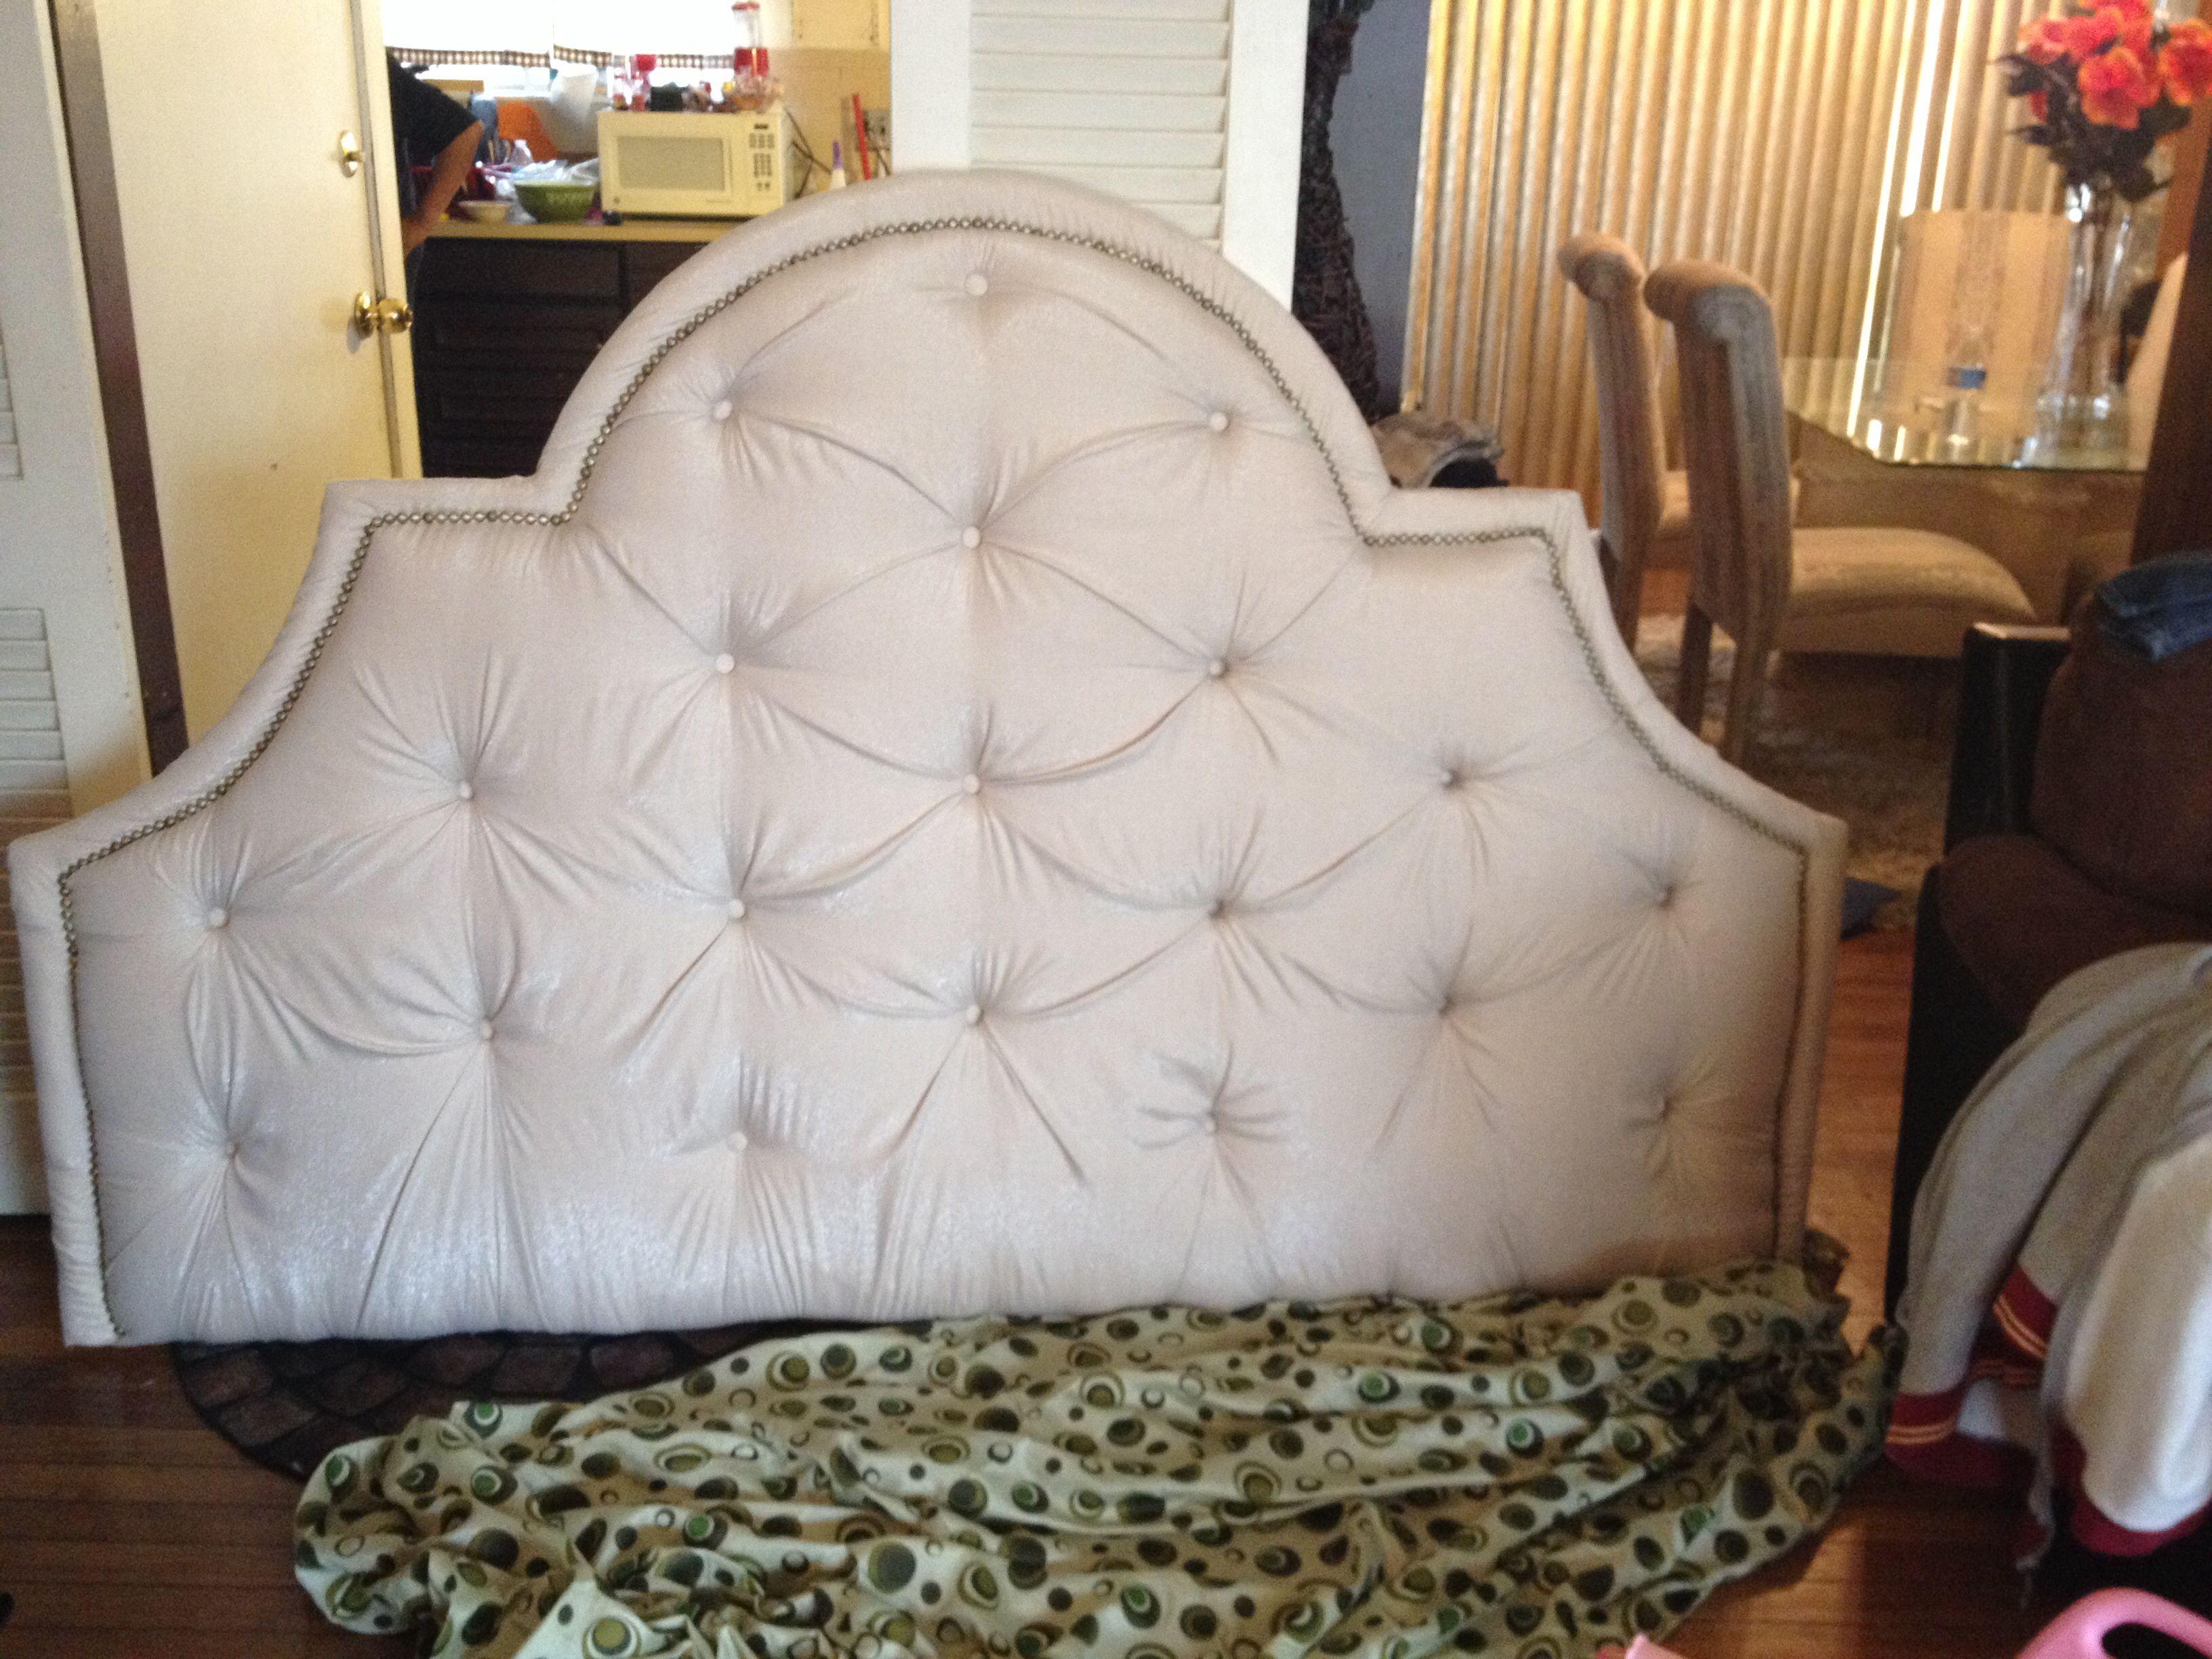 with dp amazon slipcovered annette baxton dining bed kitchen upholstered headboard x light studio modern com linen beige